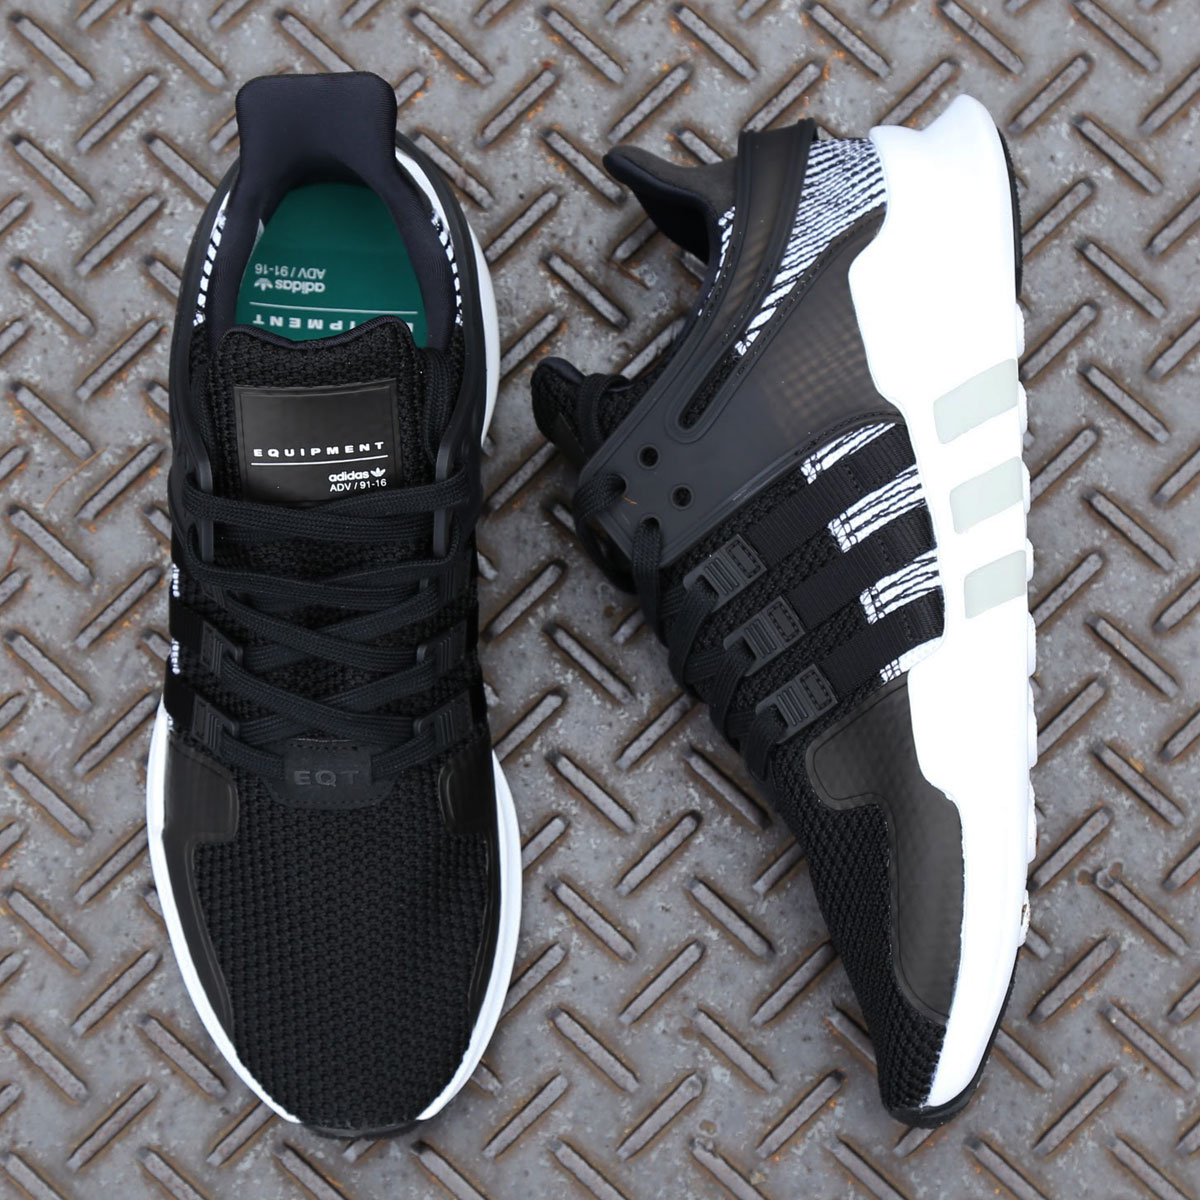 adidas Originals EQT SUPPORT ADV (アディダス オリジナルス EQT サポートADV)CORE BLACK/CORE BLACK/RUNNING WHITE【メンズ スニーカー】17FW-S